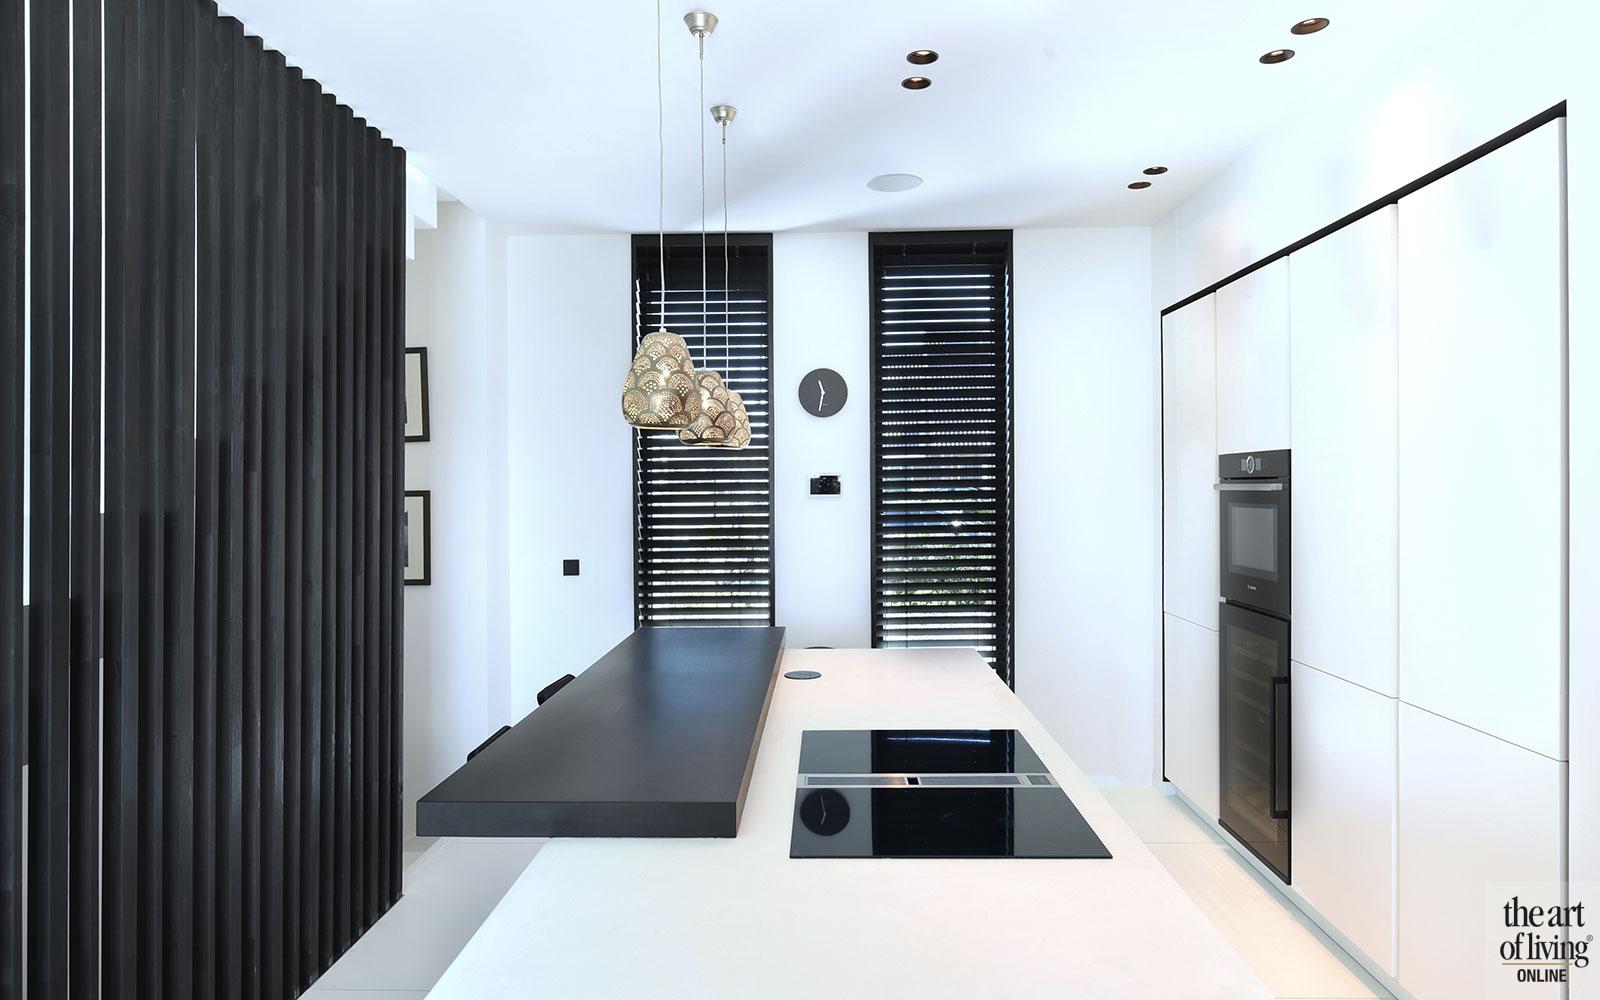 raambekleding, raamdecoratie, shutters, blinds, gordijnen